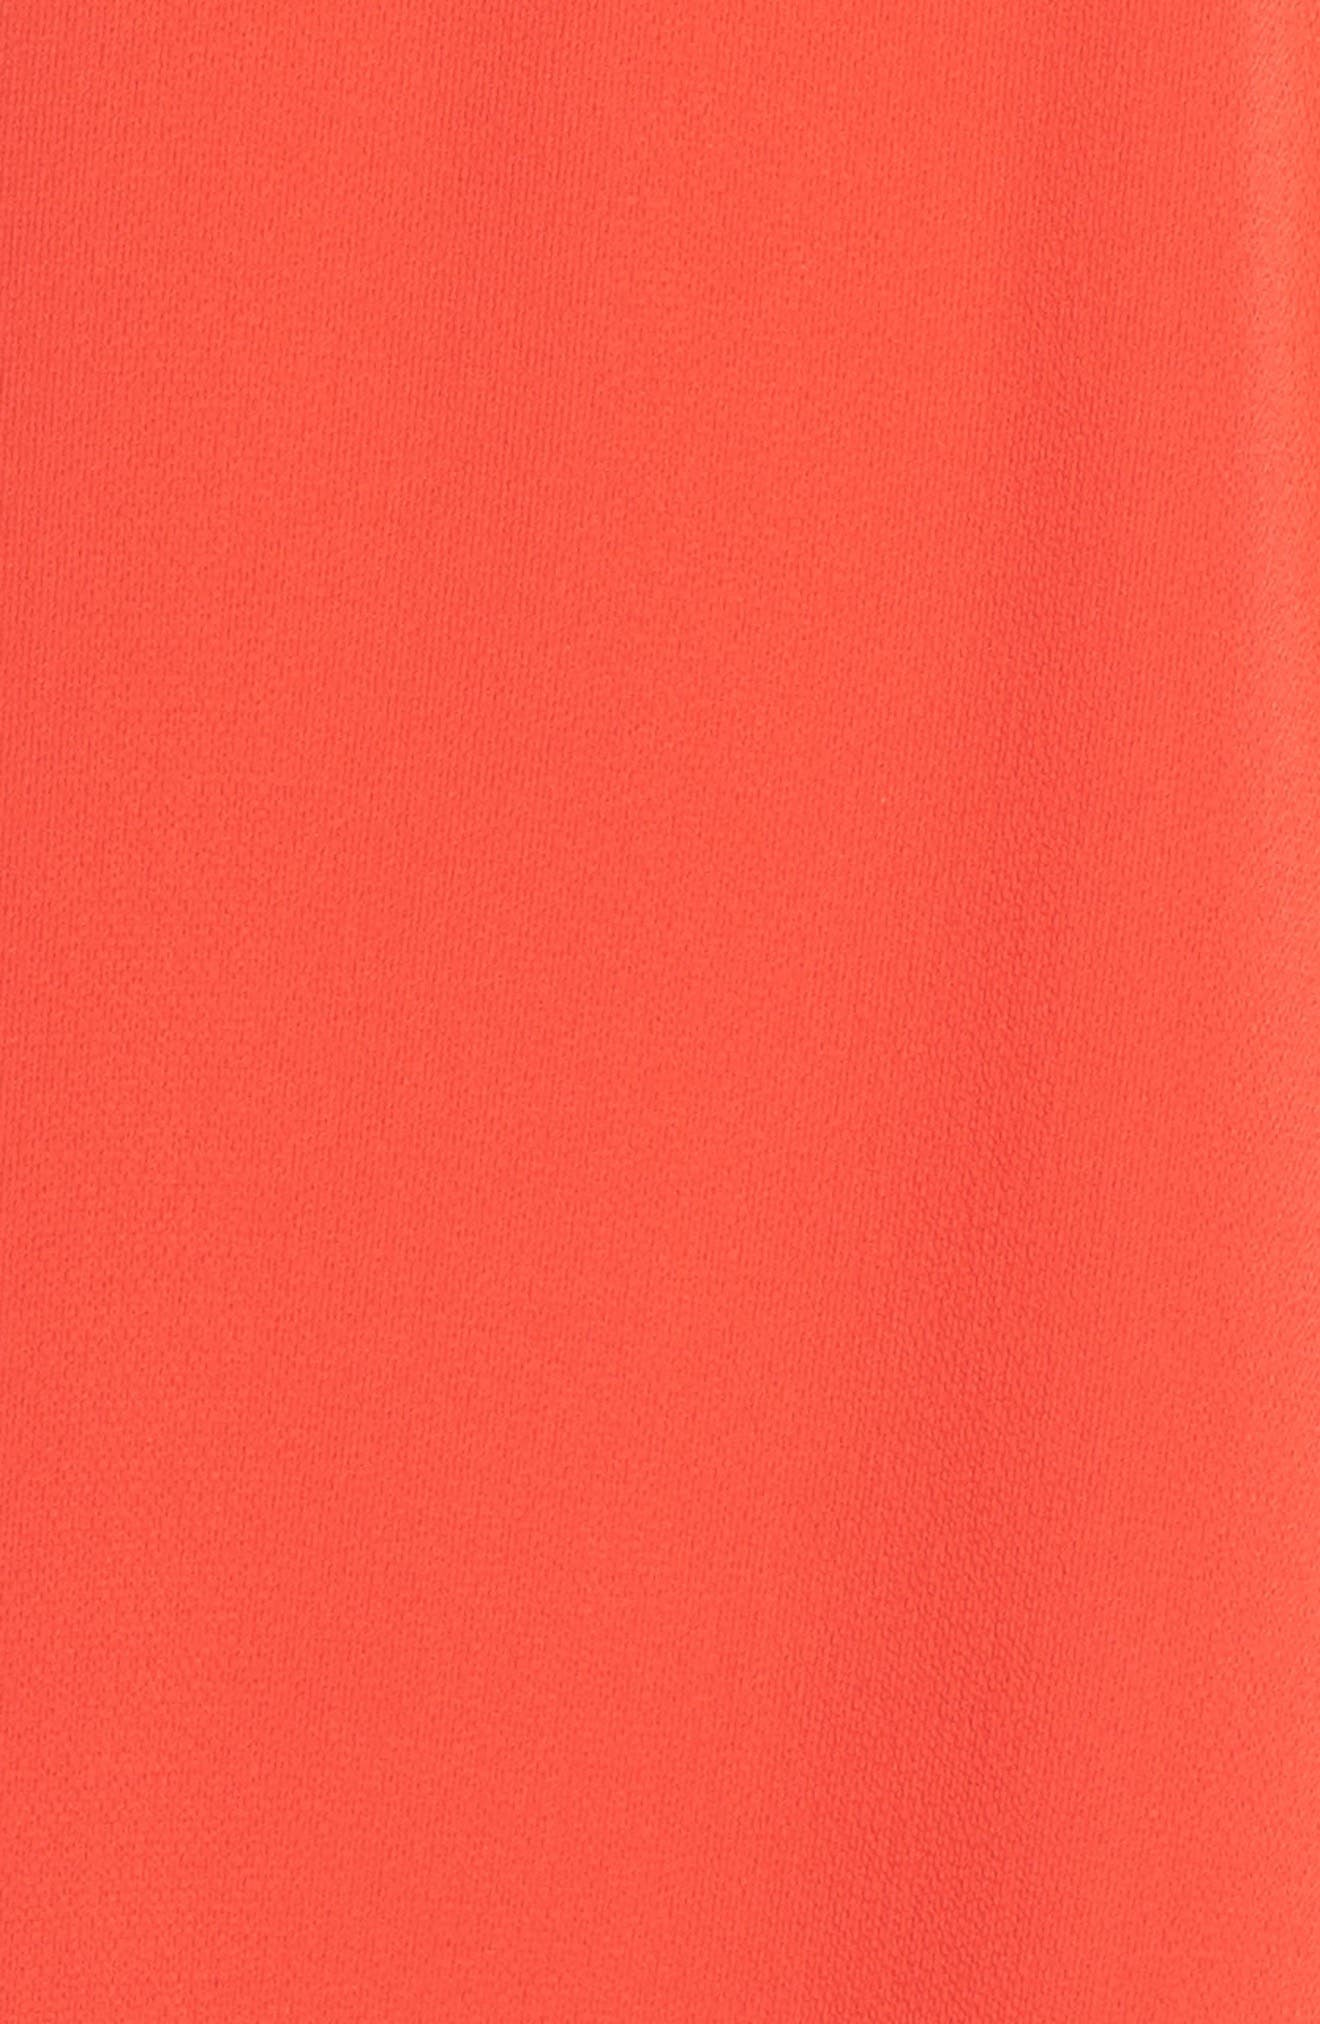 Ruffle Fit & Flare Dress,                             Alternate thumbnail 6, color,                             Raspberry